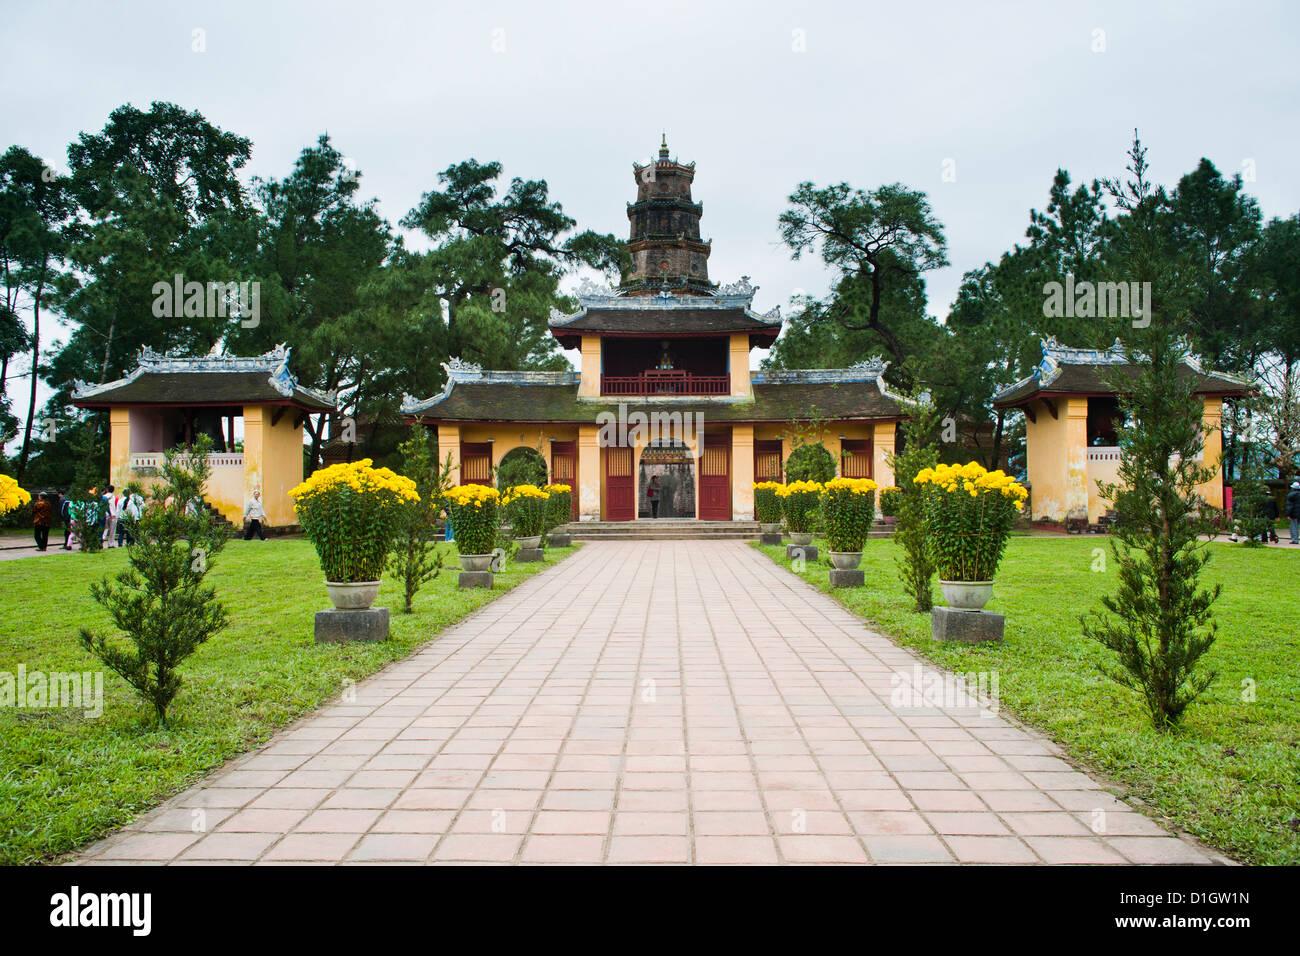 Buildings near the Thien Mu Pagoda, Hue, Vietnam, Indochina, Southeast Asia, Asia - Stock Image